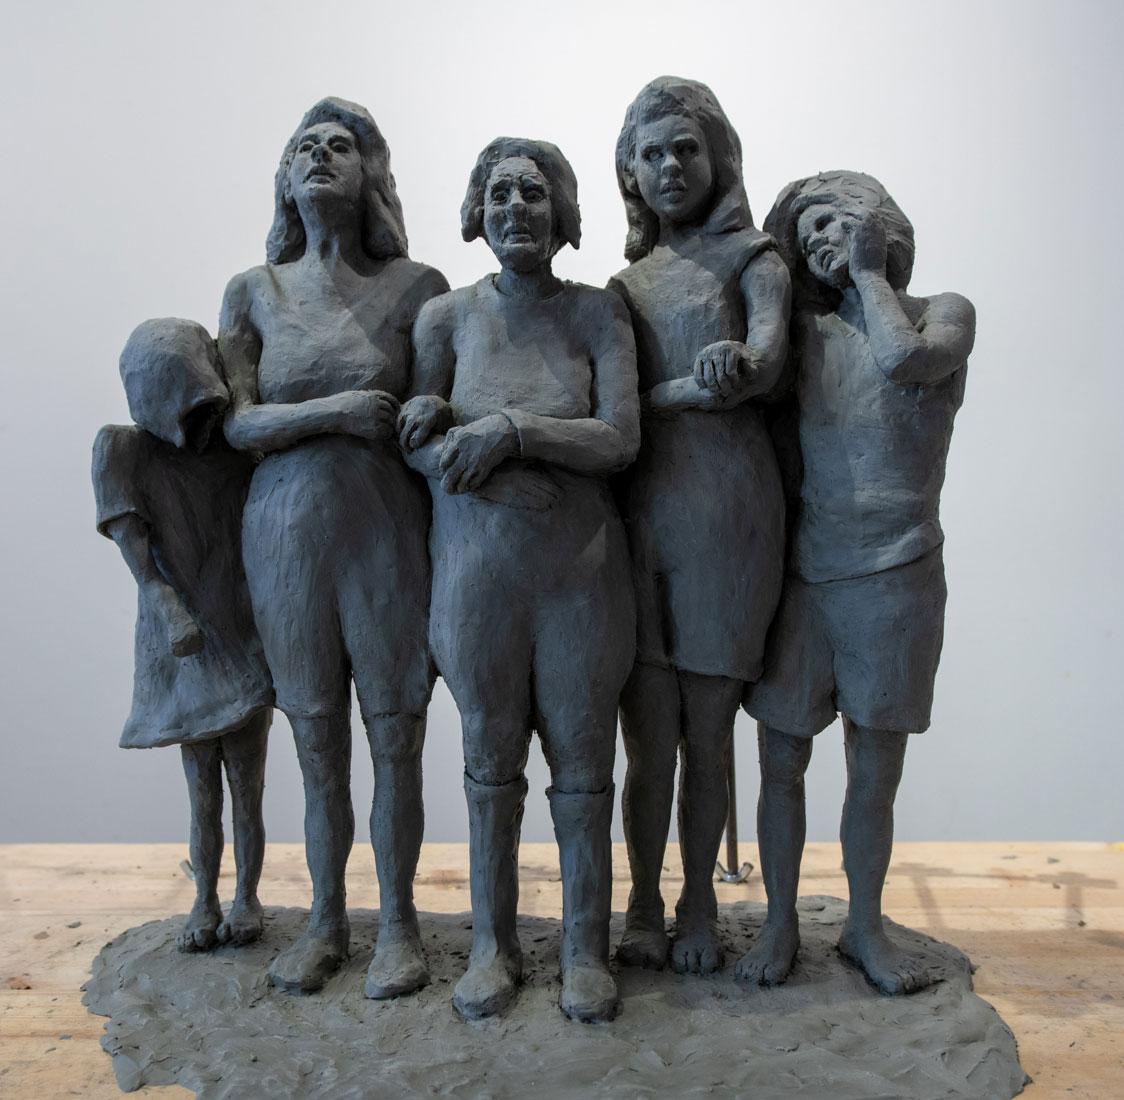 Monument maquette